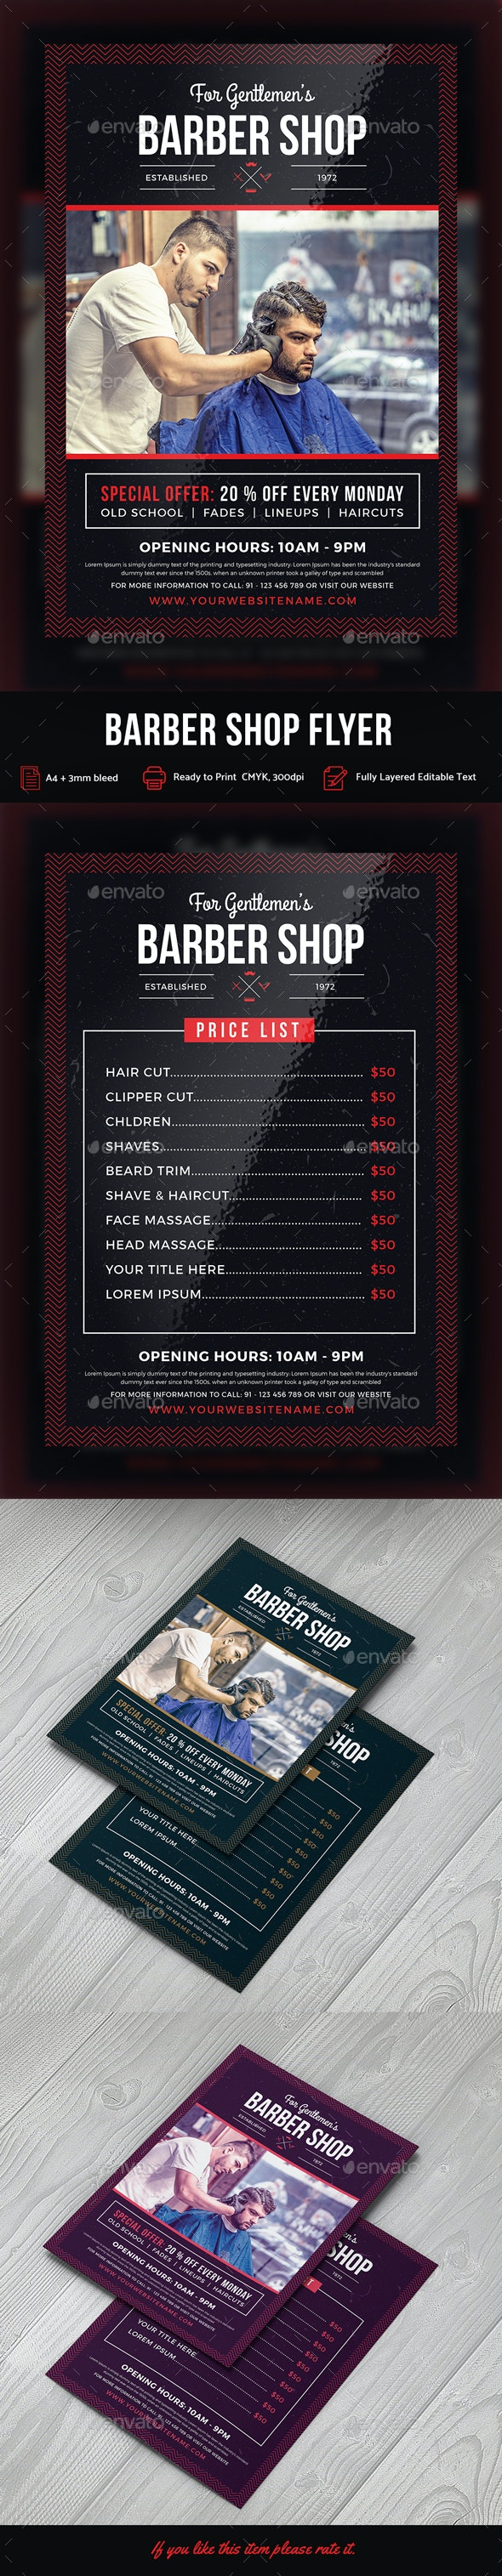 Barbershop Flyer - Print Templates